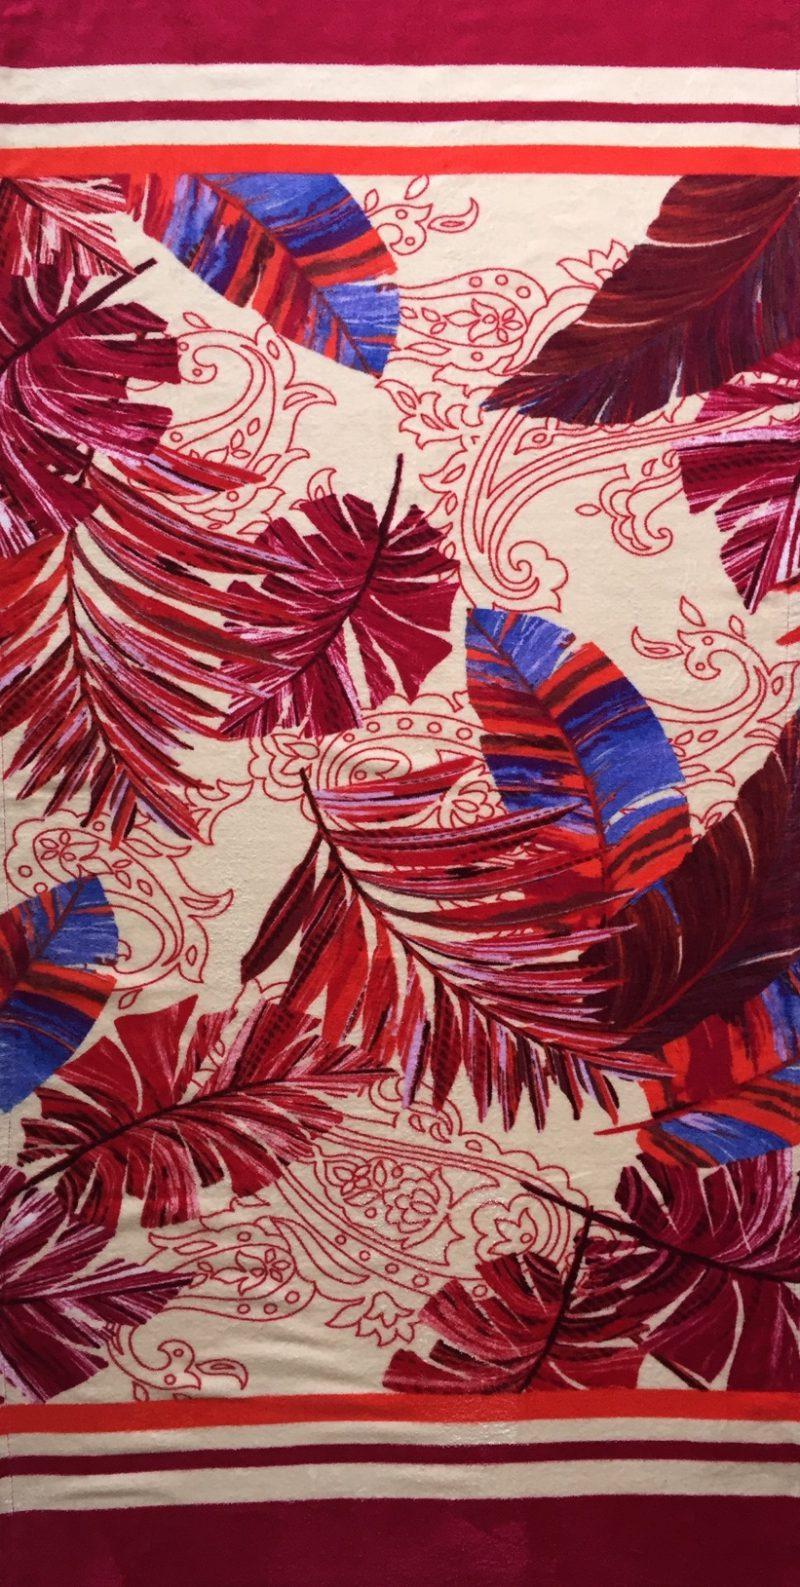 Aqua Perla-Beach Towel - Tropics - Turkish cotton-4486